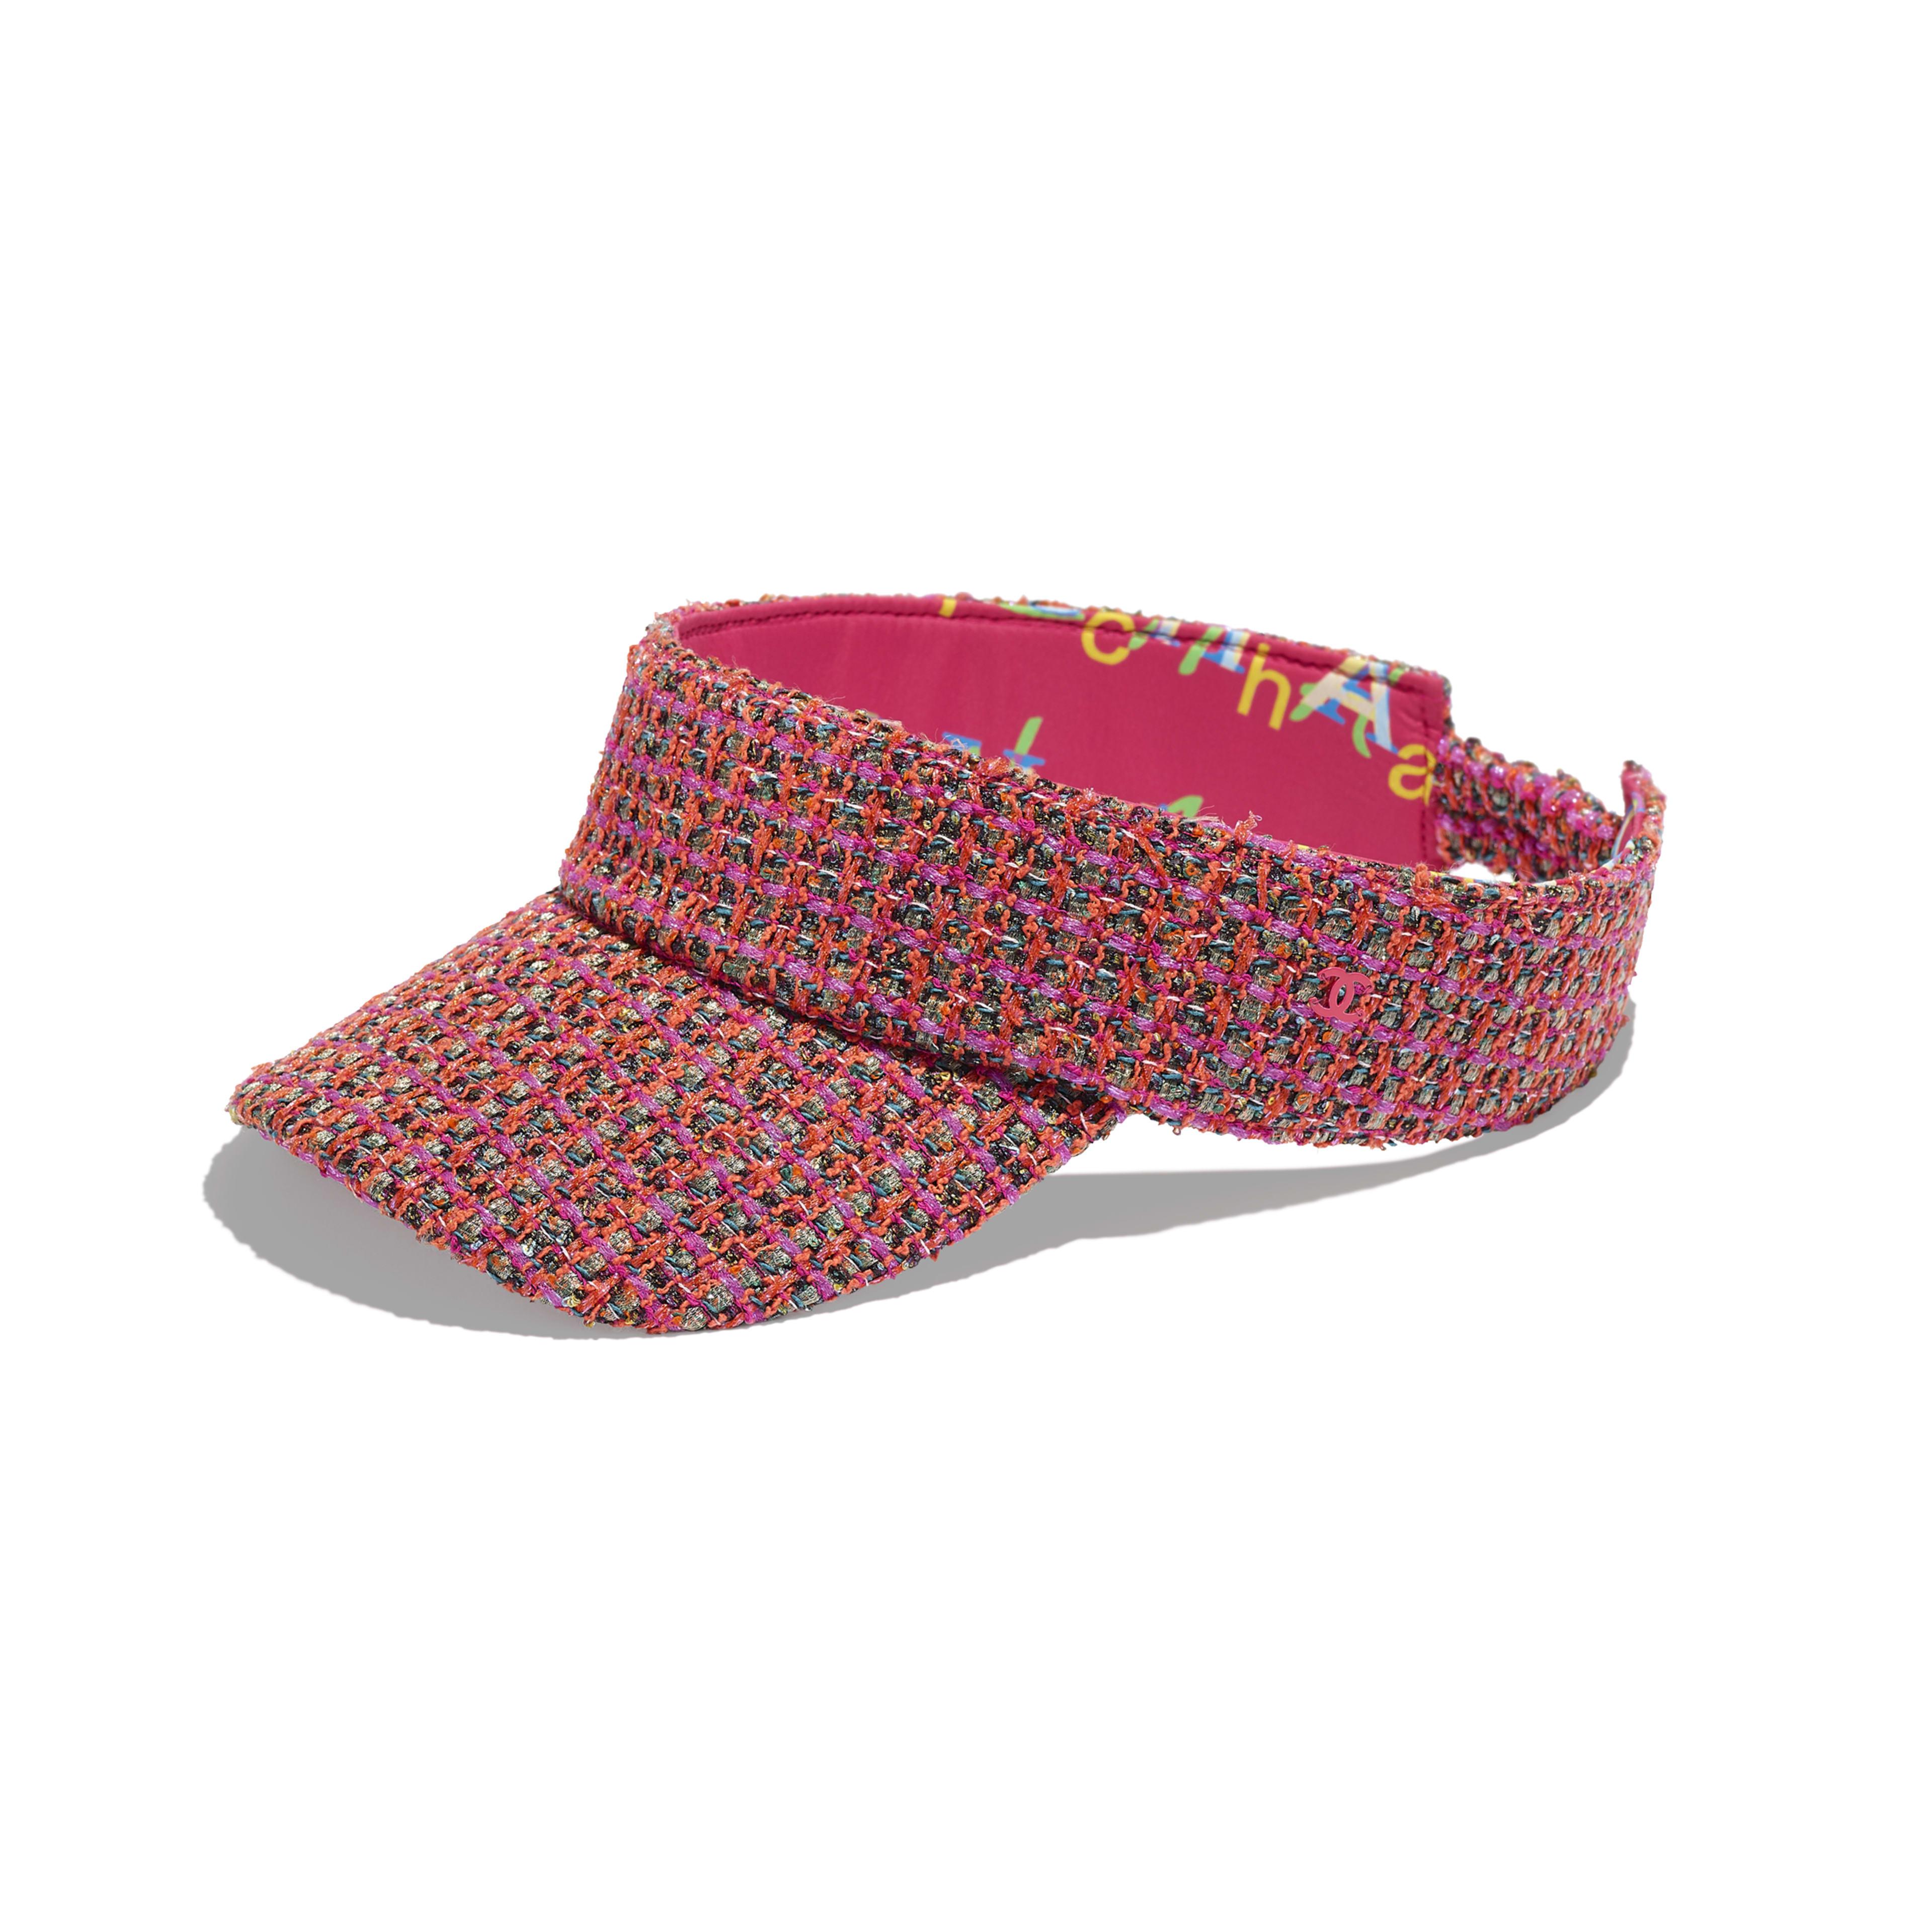 4c4e8684c08 Tweed   Mixed Fibers Pink